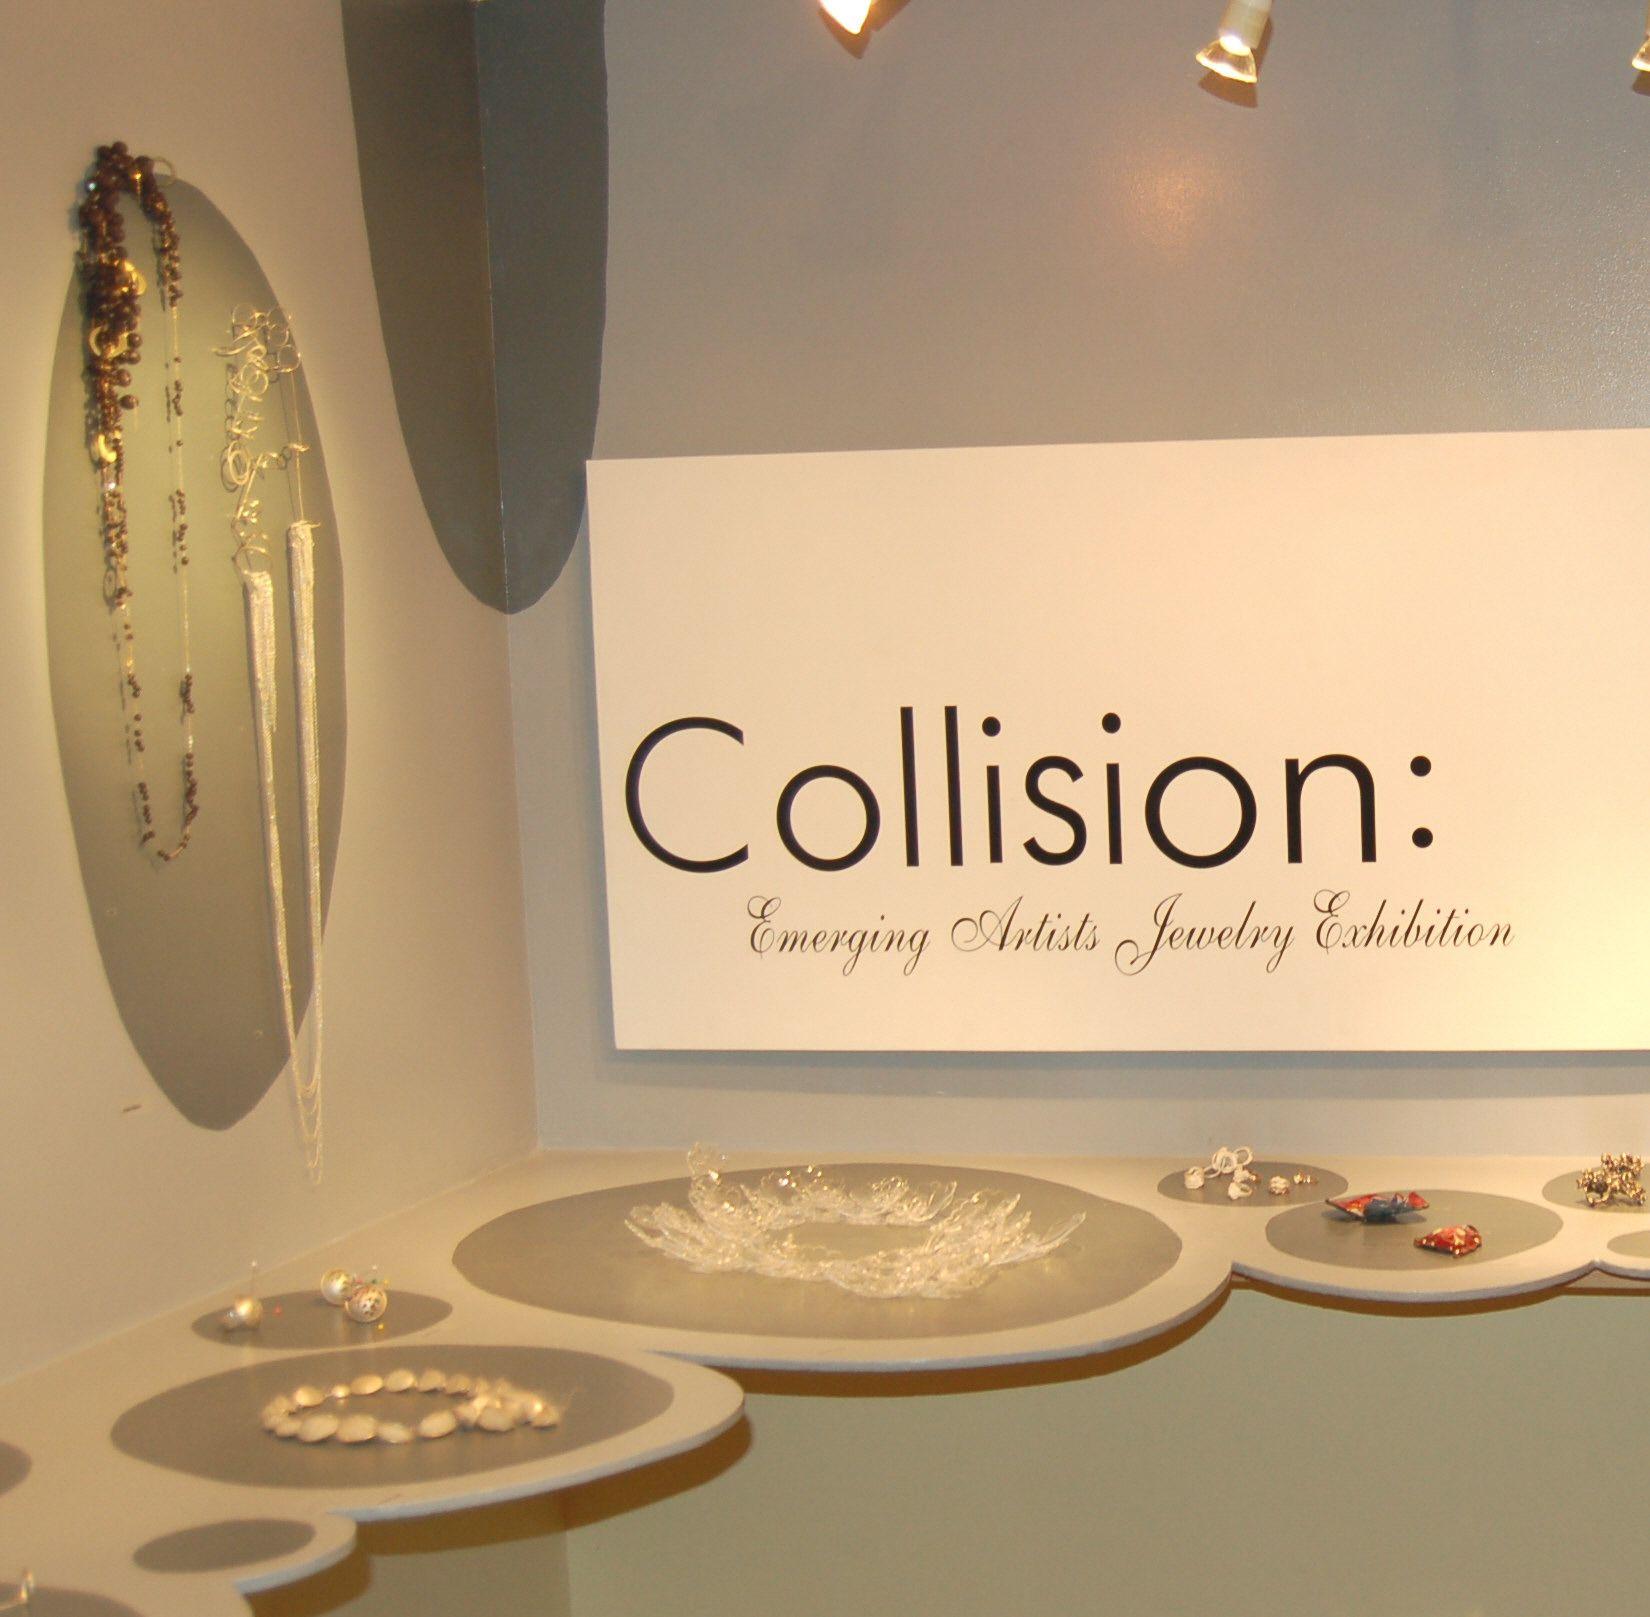 Window display ideas for jewelry  heidi lowe gallery  exhibitions    exhibition display